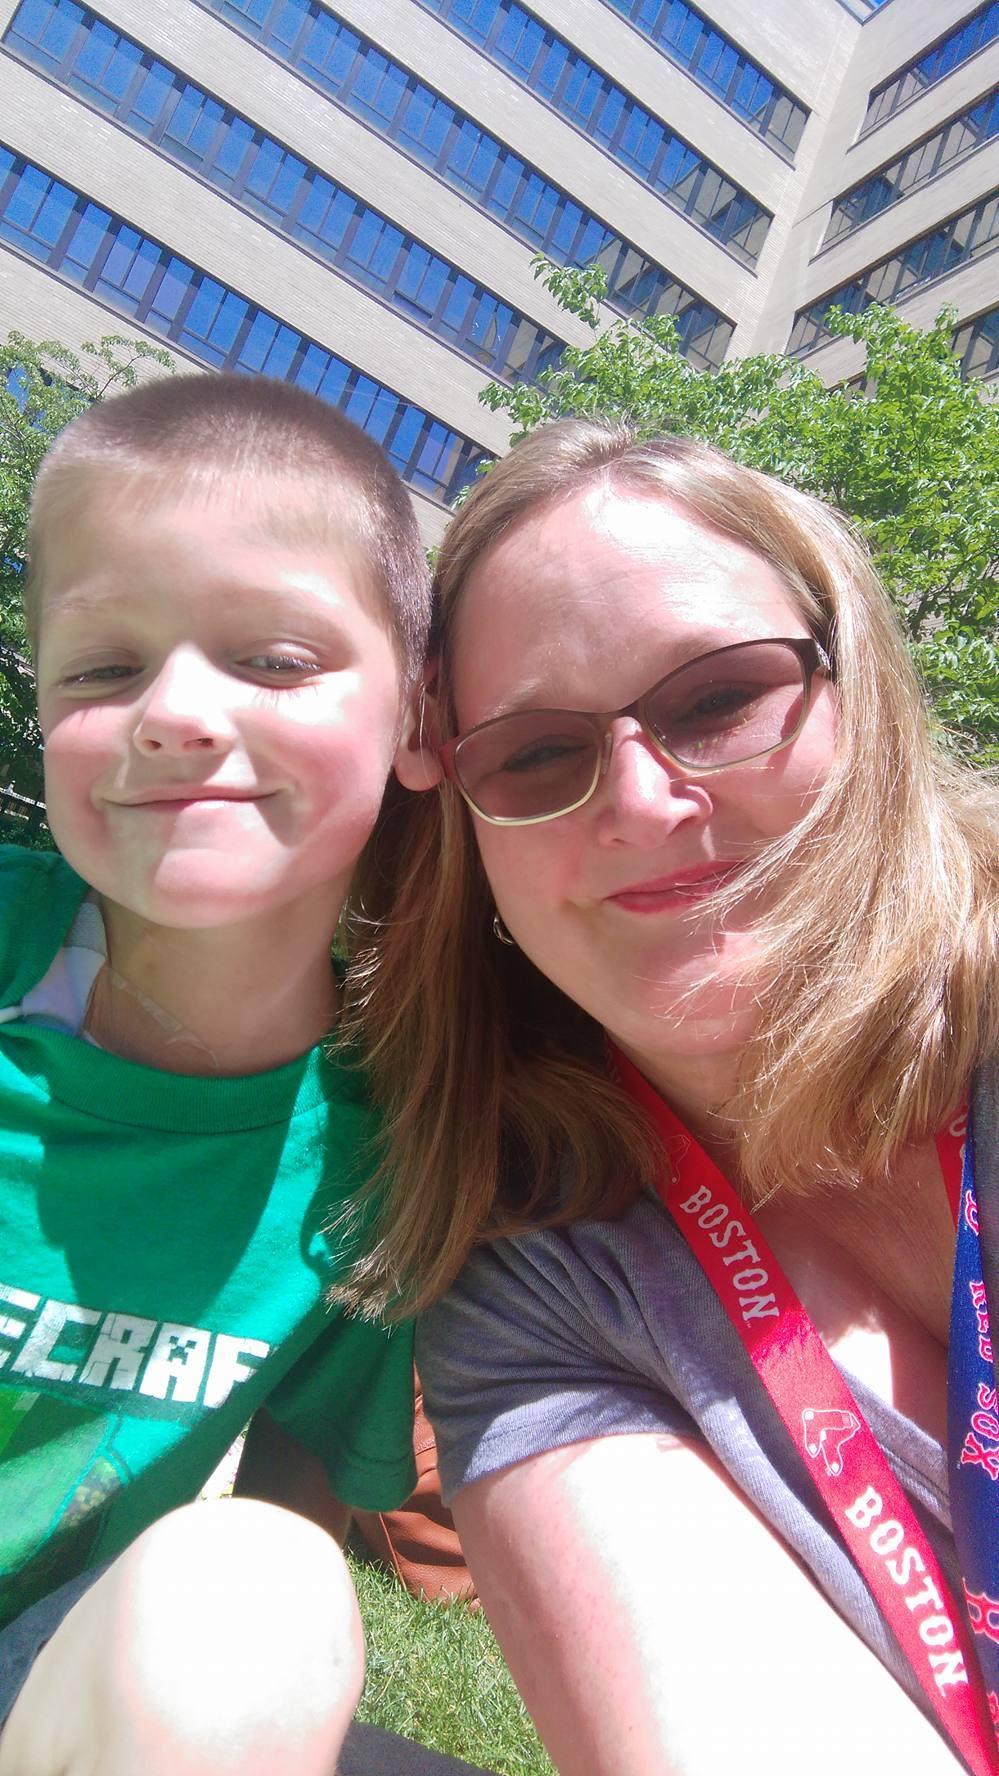 Owen and his mom, Kristina